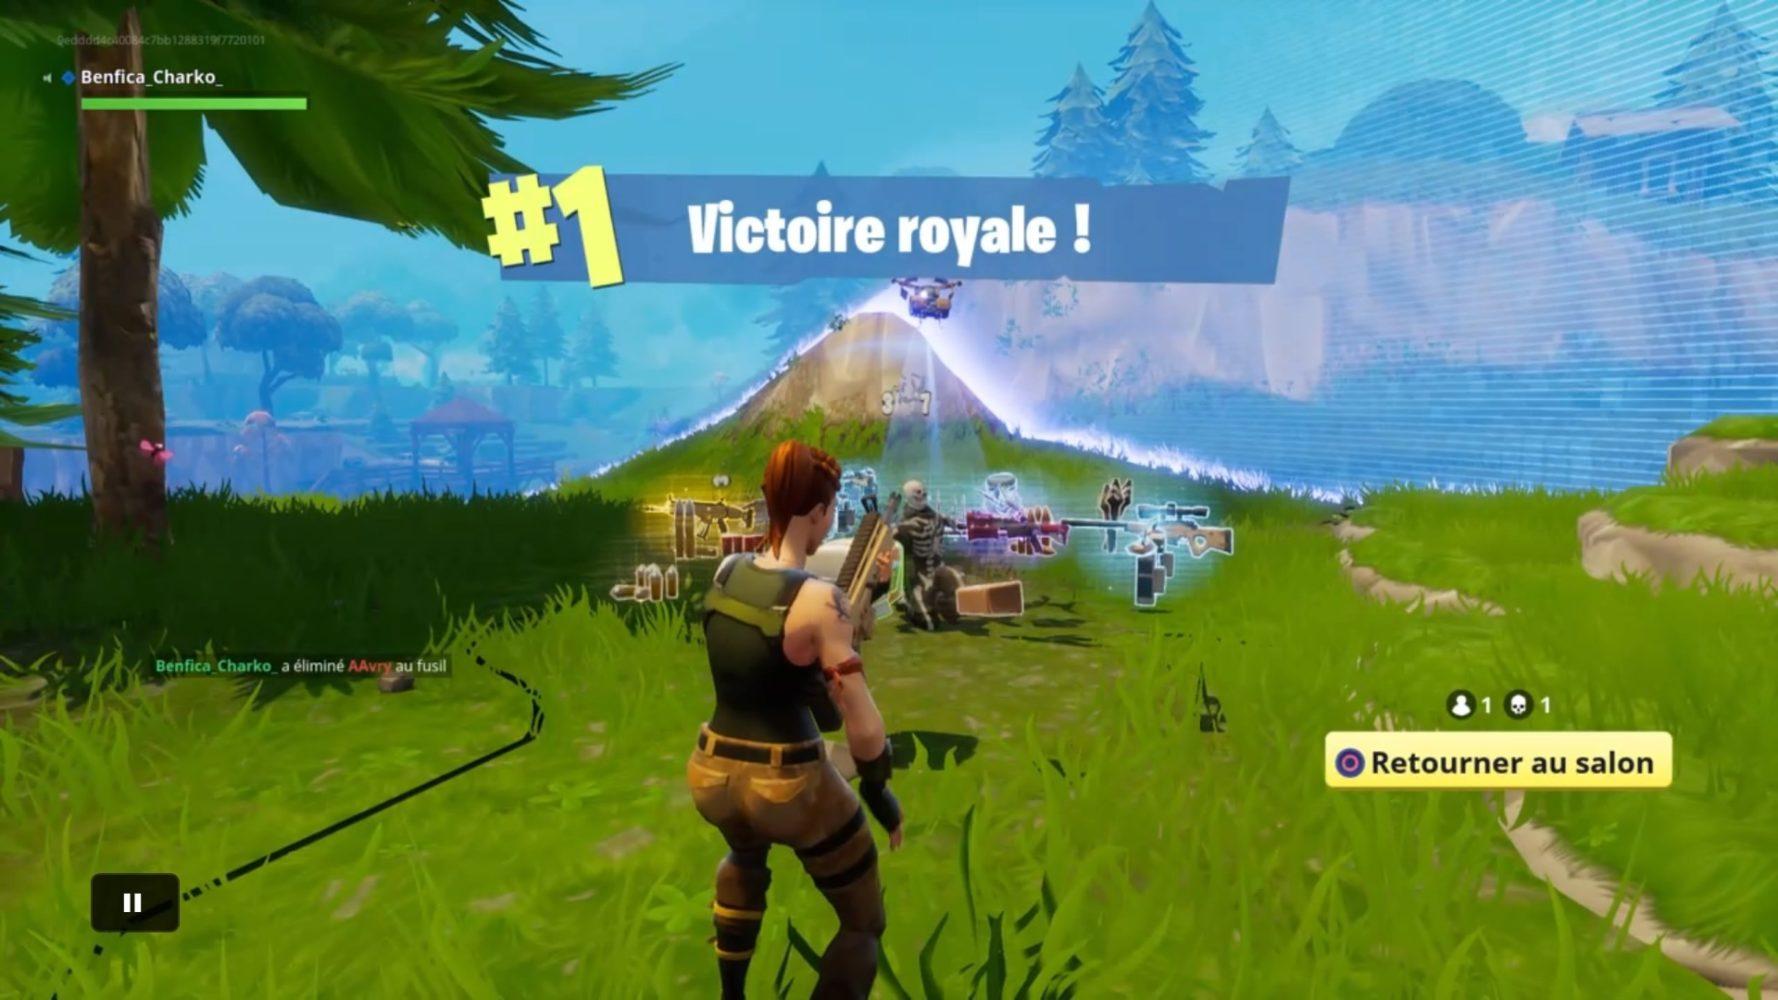 Fortnite victoire